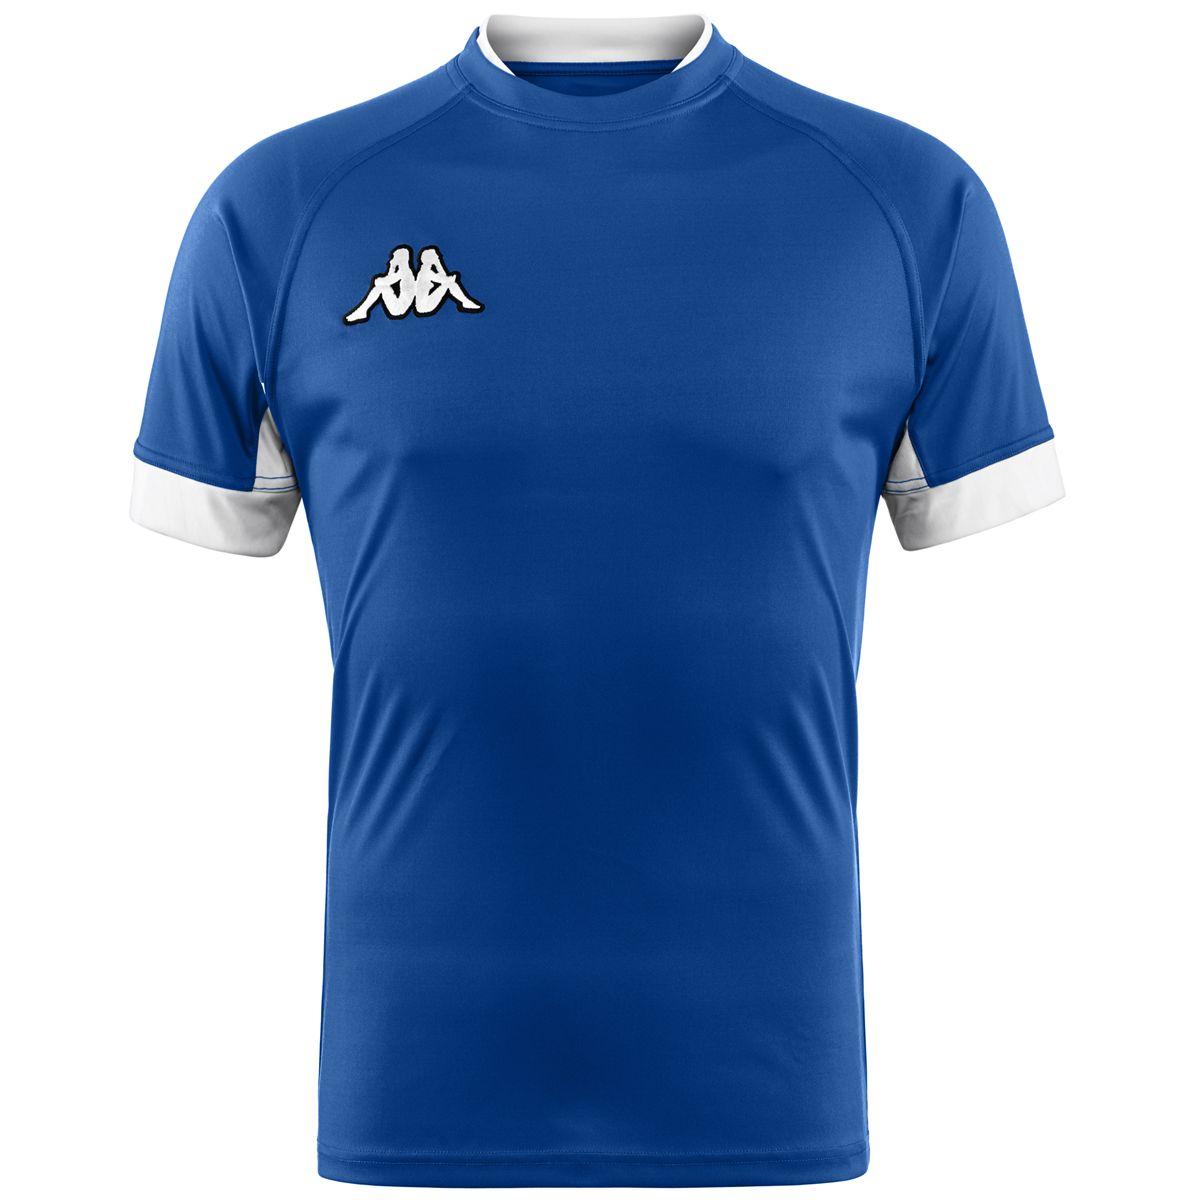 Kappa T-shirt sportiva KAPPA4RUGBY AMPION Bambino Ragazzo Rugby Camicia